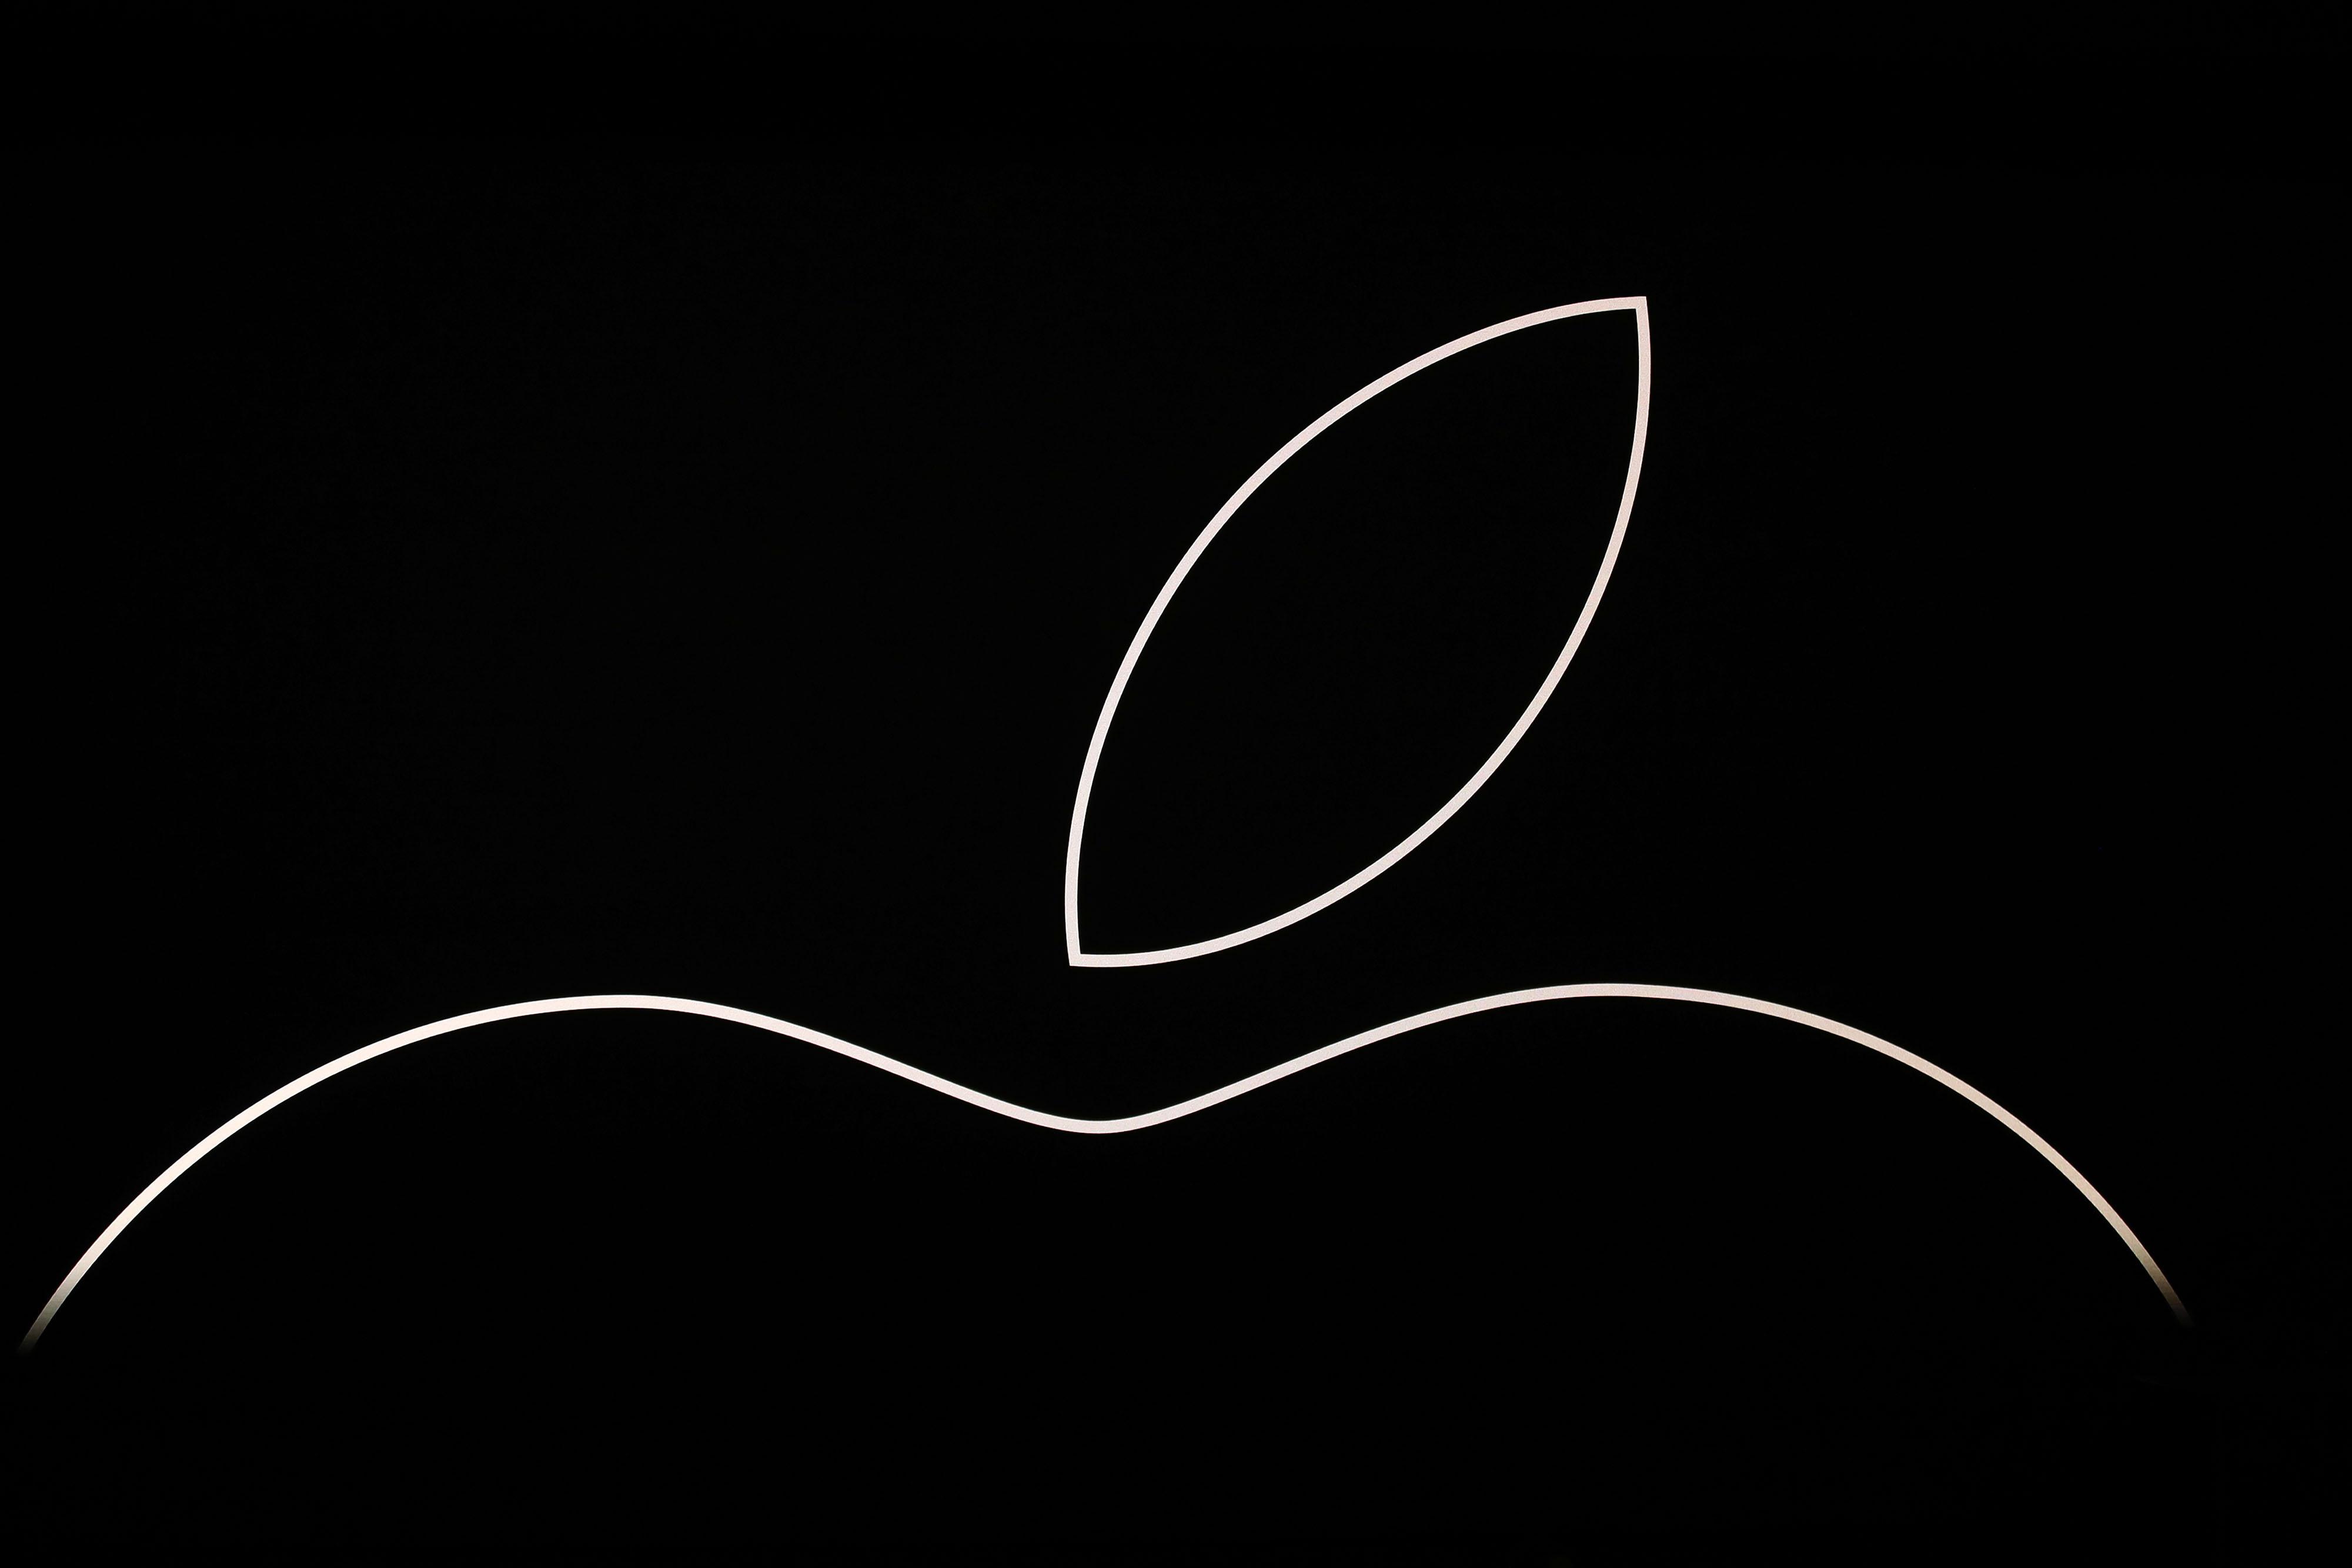 Apple расширяет сотрудничество с киноиндустрией